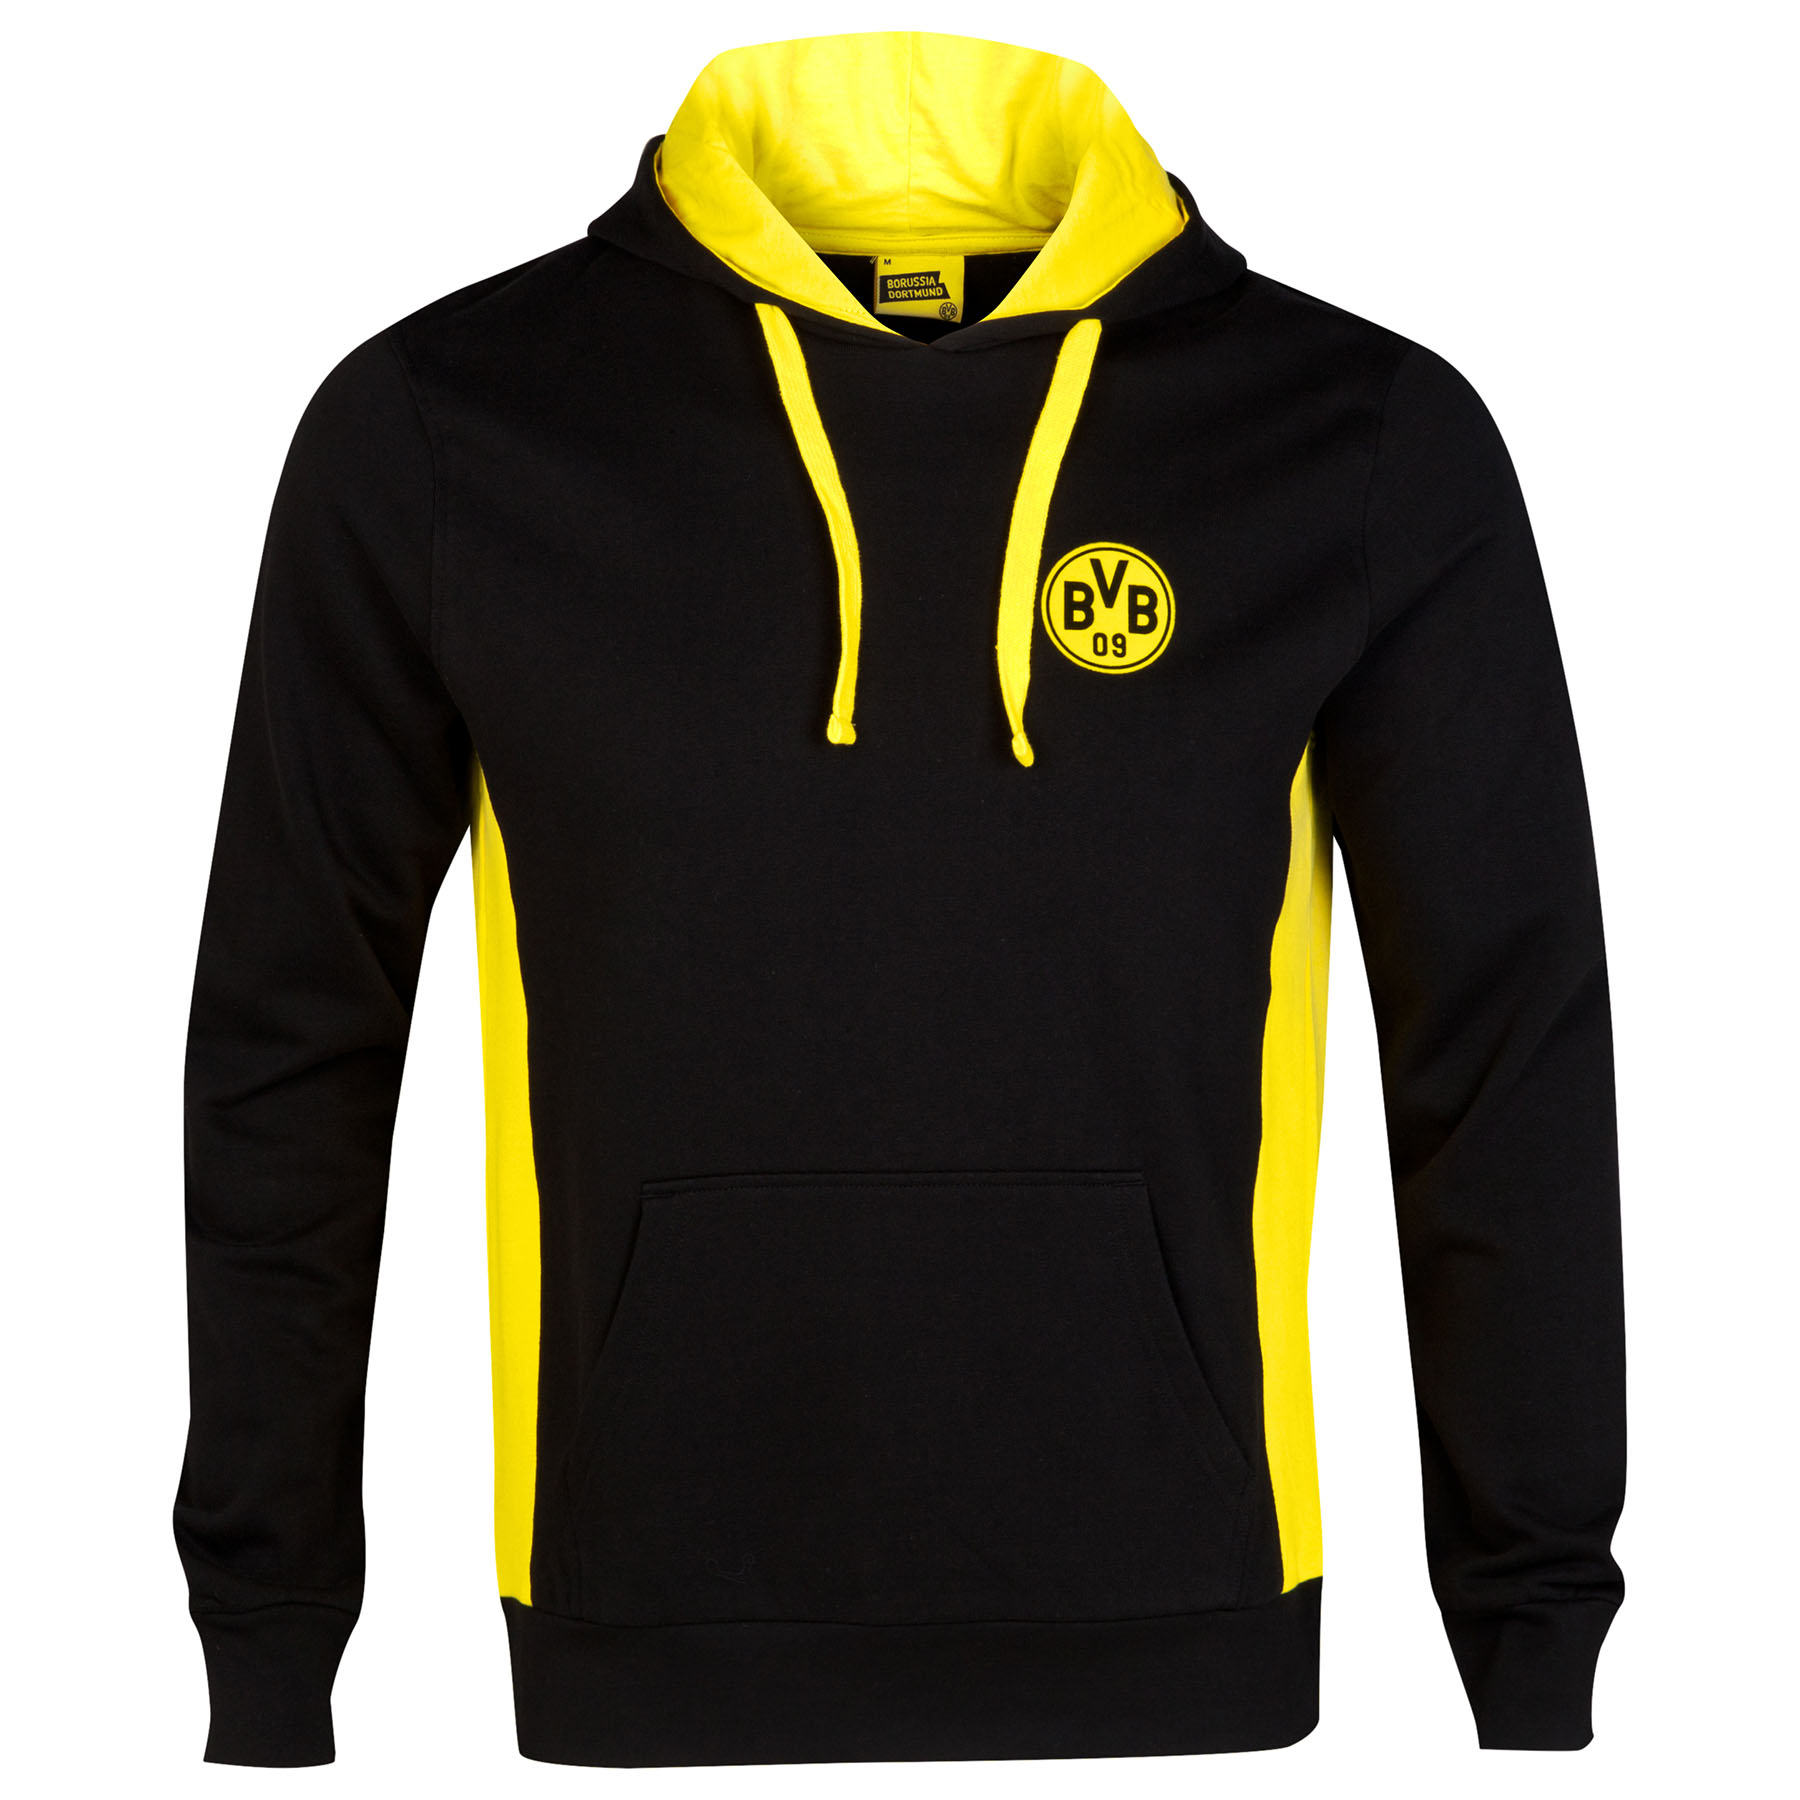 BVB Crest Hoodie - Black